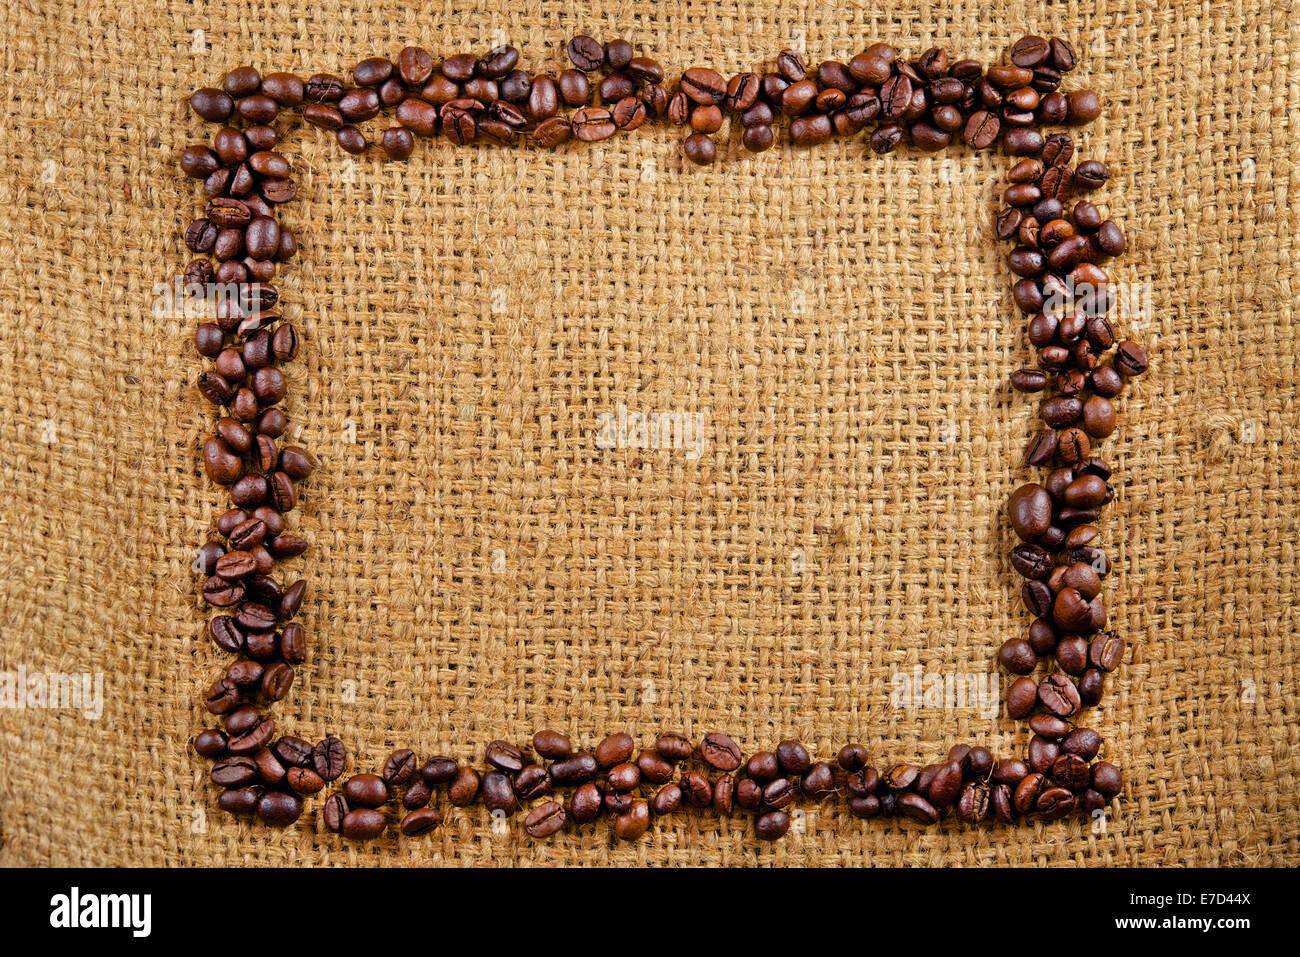 Coffee frame on burlap bag - Stock Image